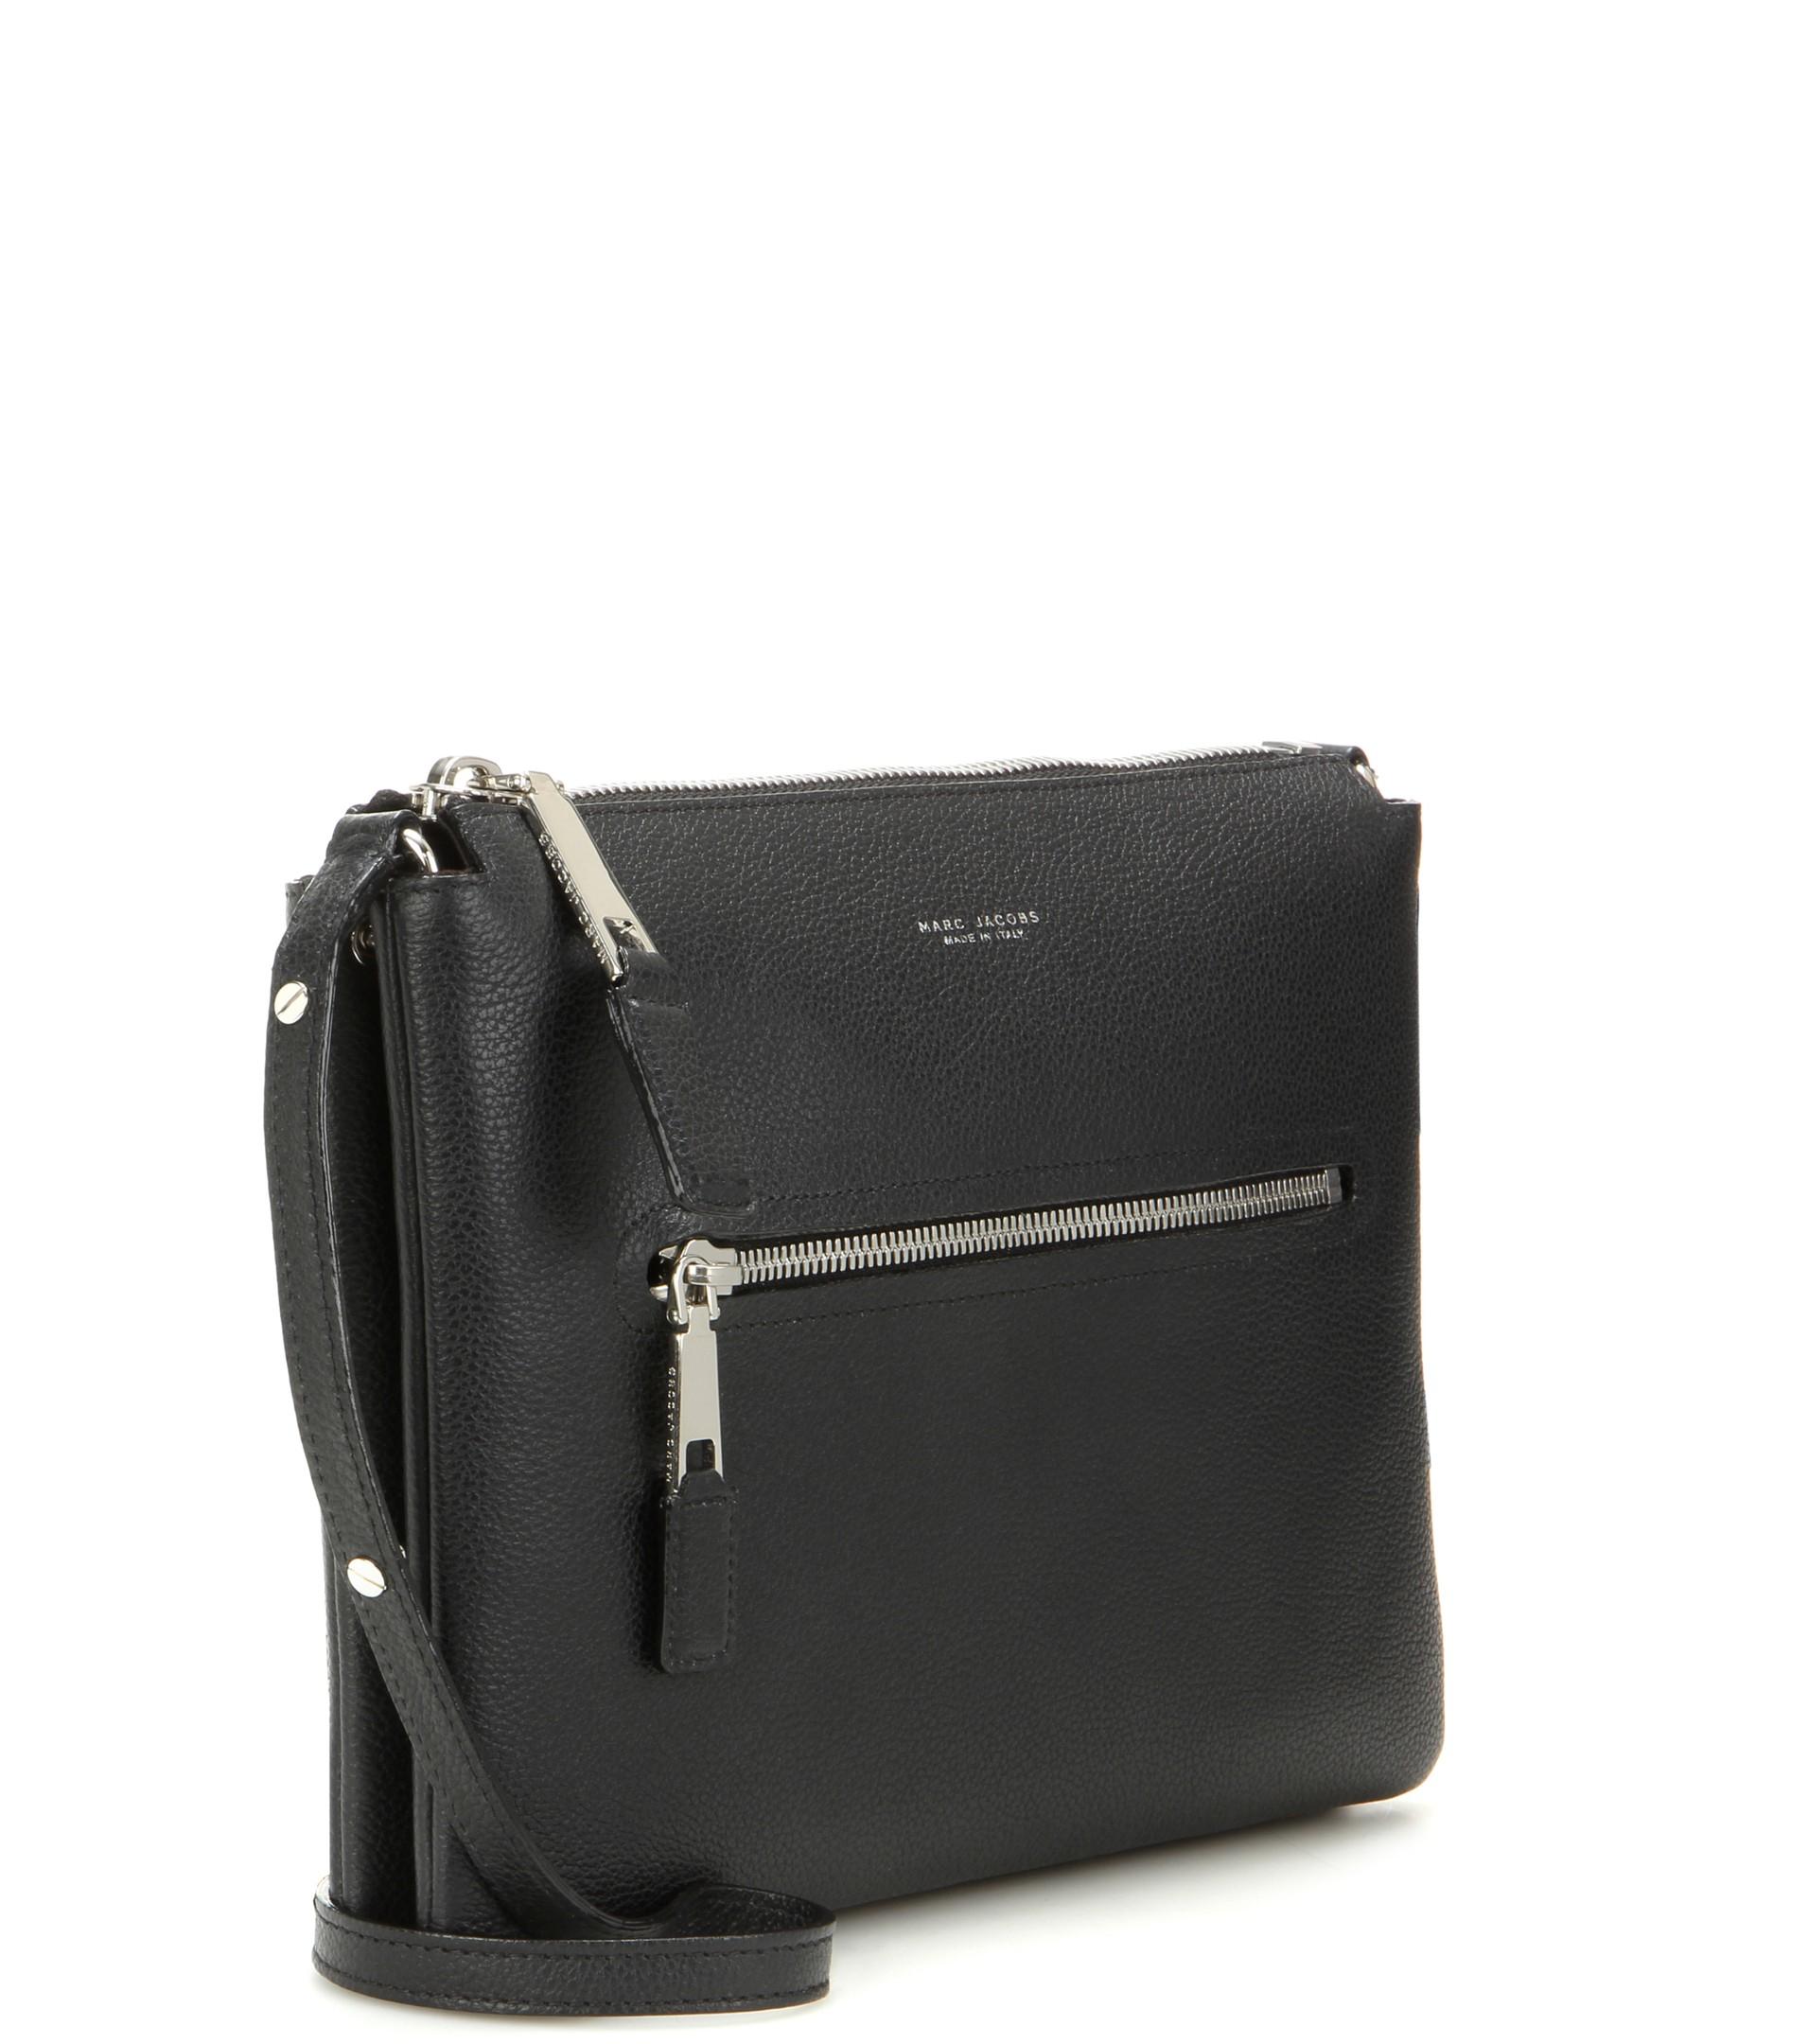 Double Pochette Leather Shoulder Bag